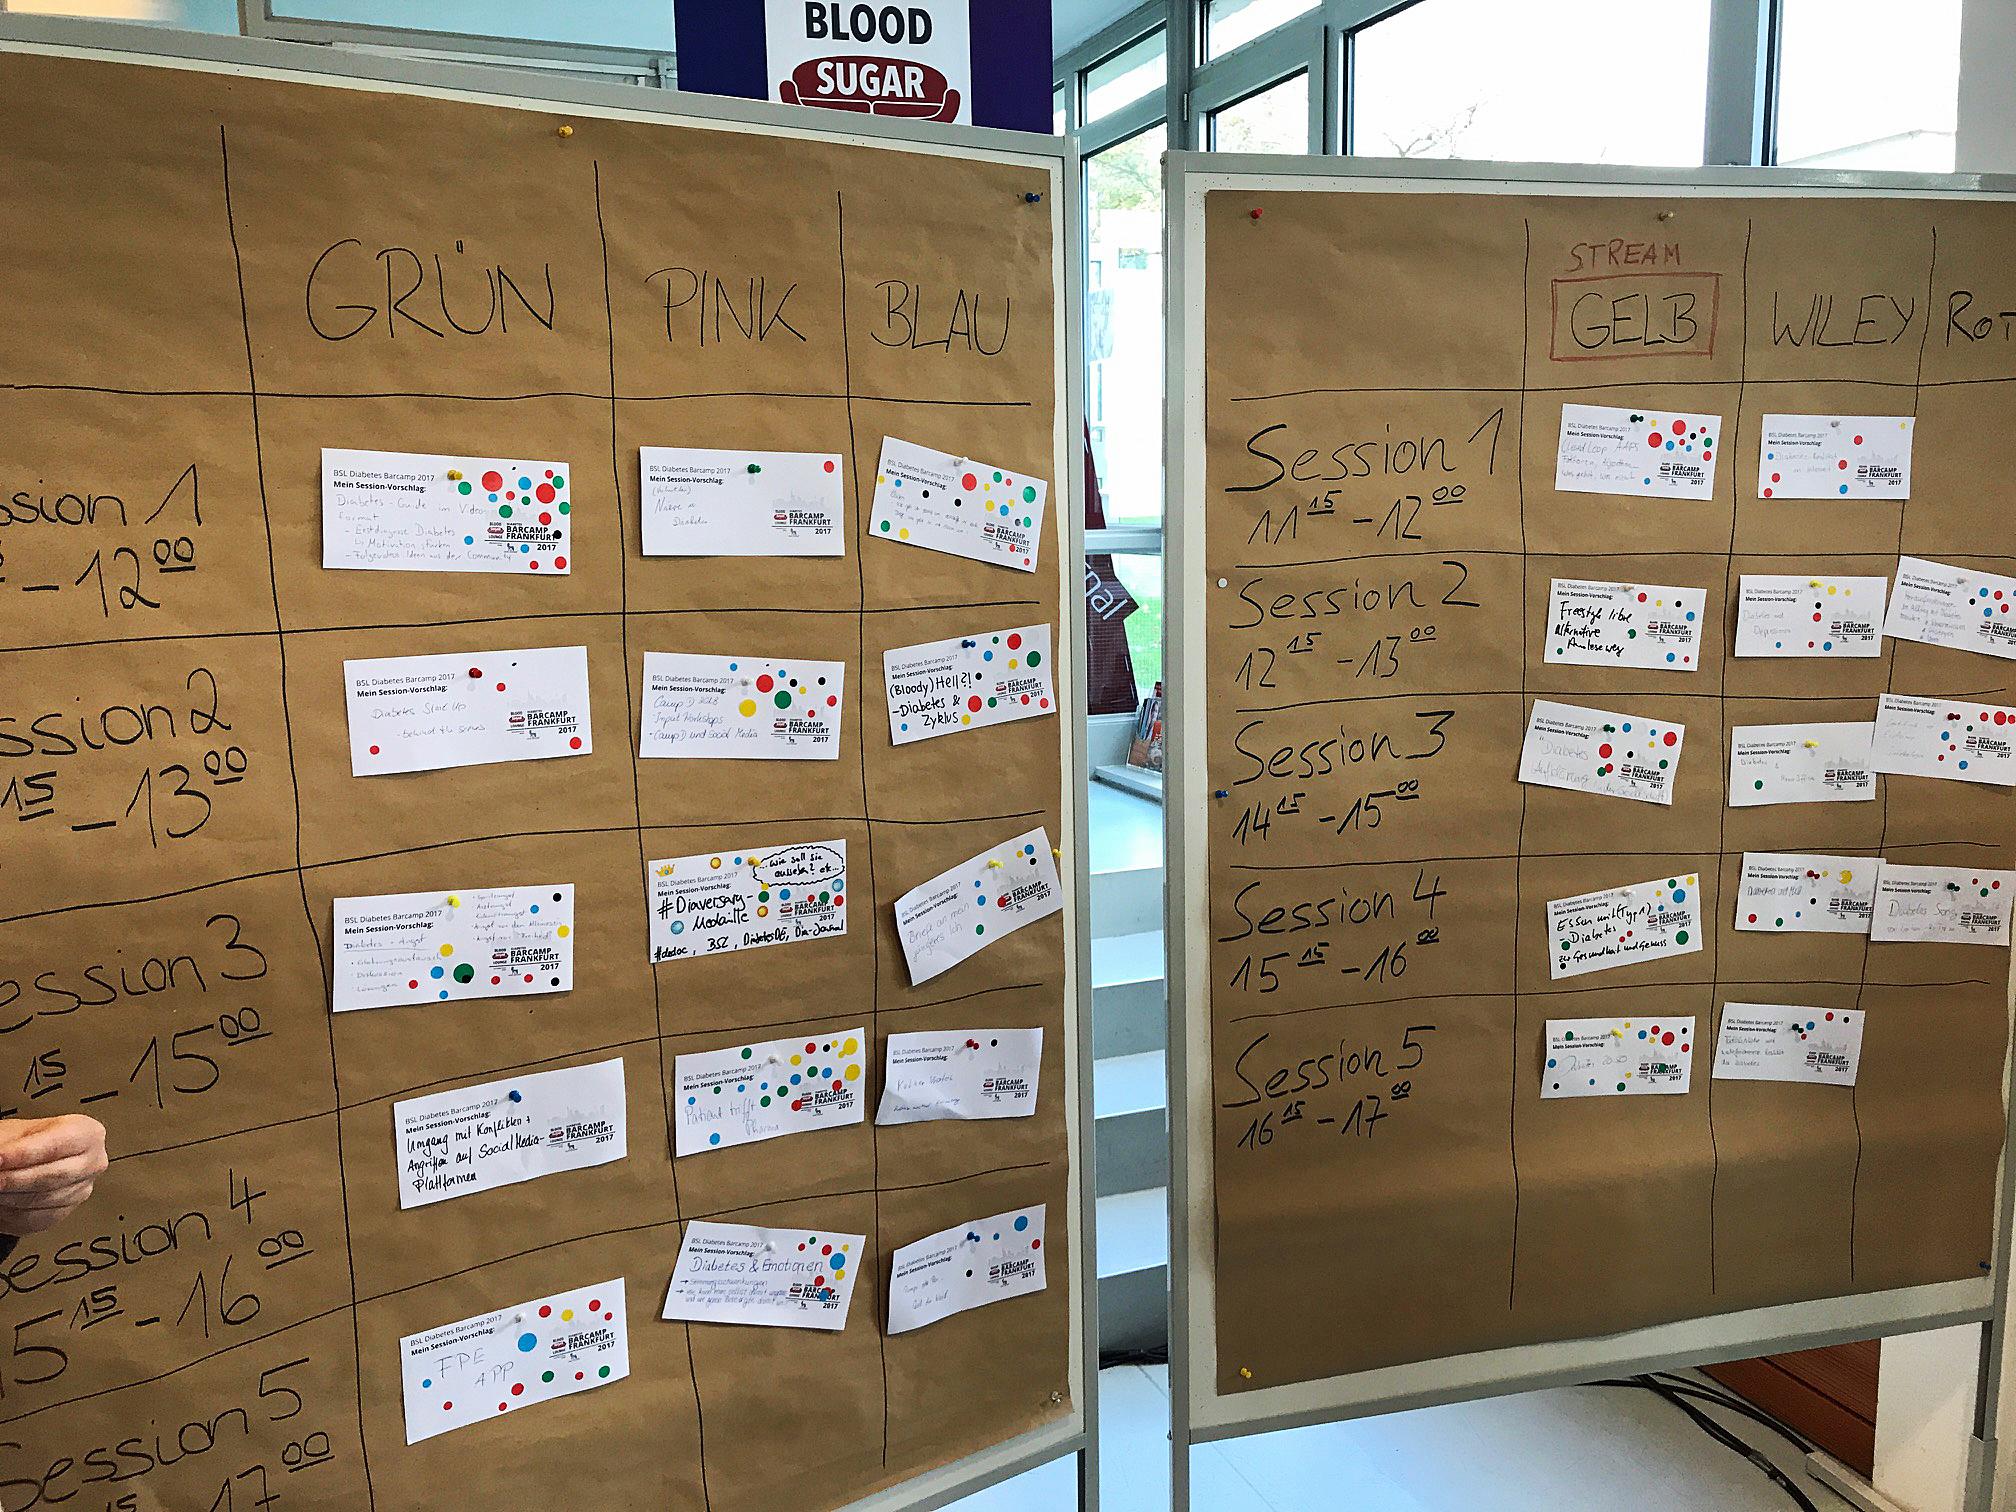 Diabetes Barcamp Themen